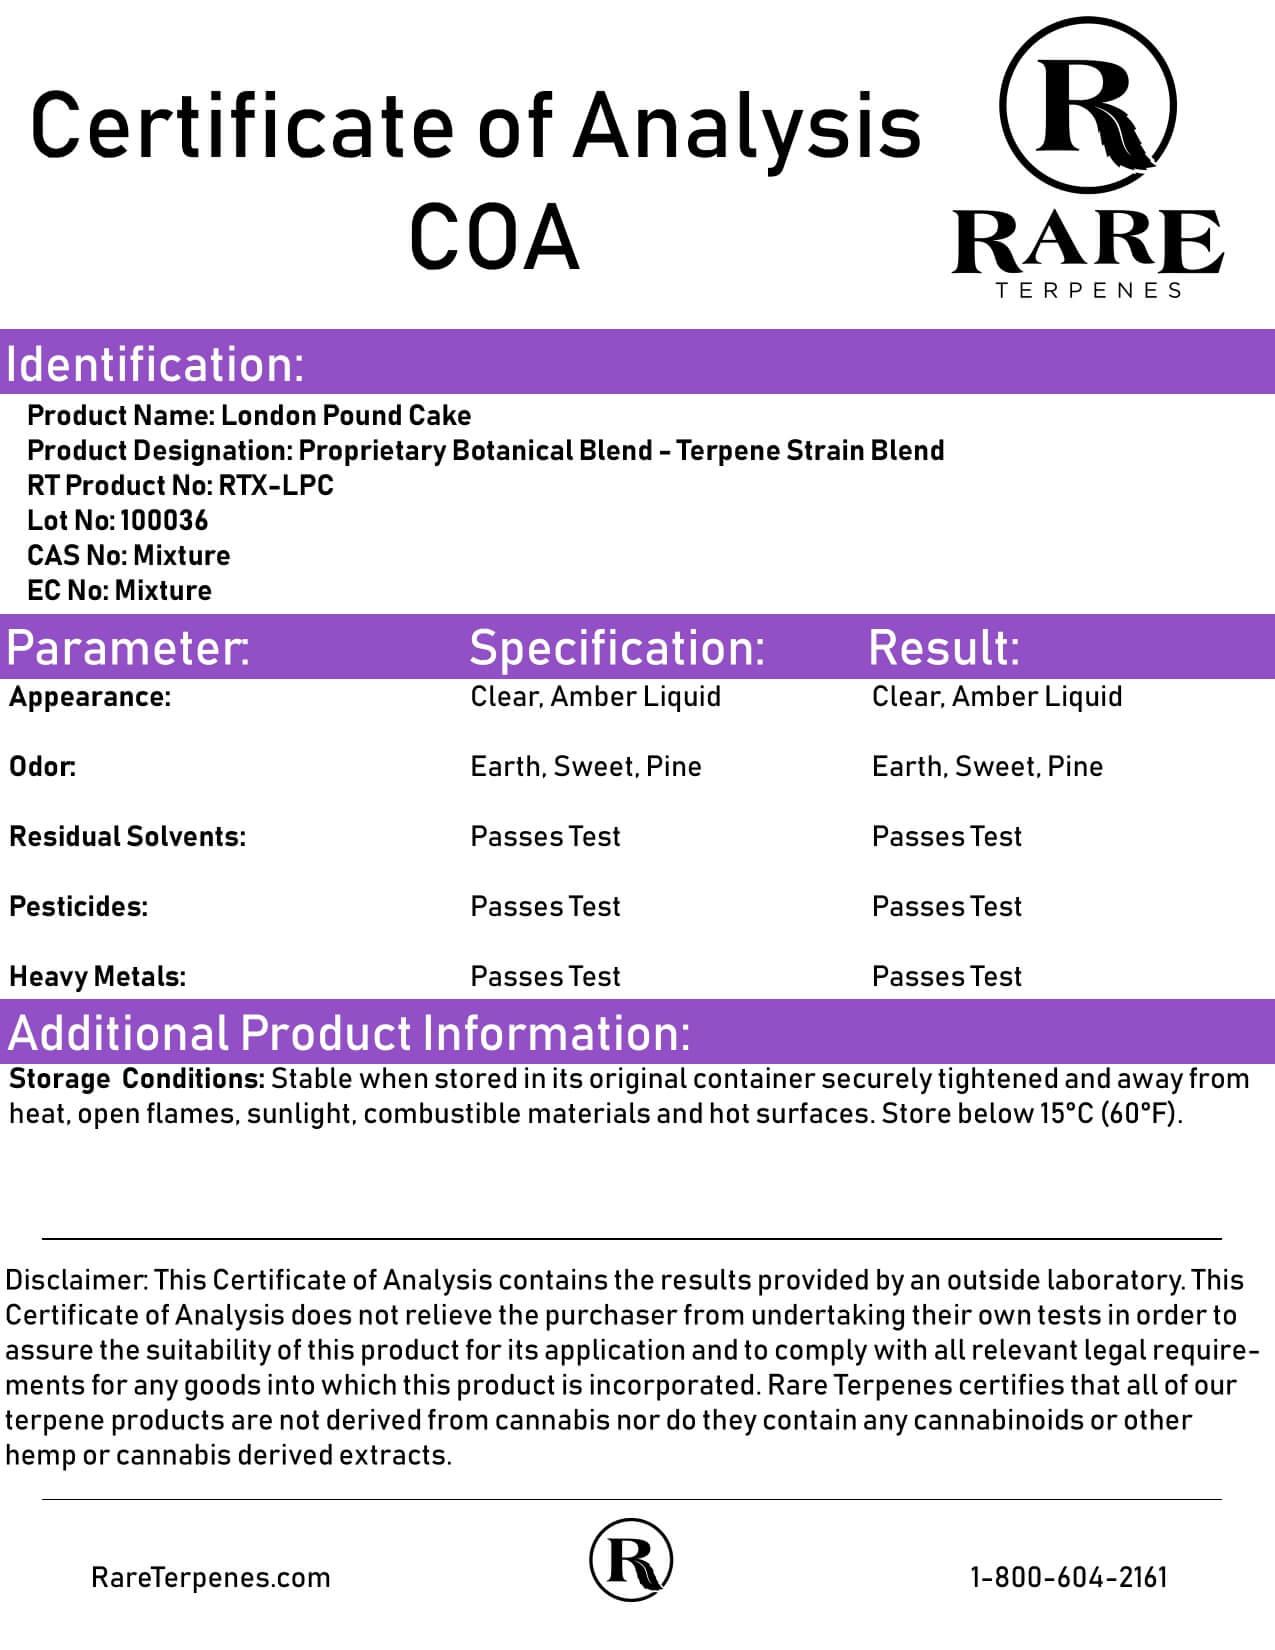 Rare Terpenes Tepene Strain Blends London Pound Cake Lab Report